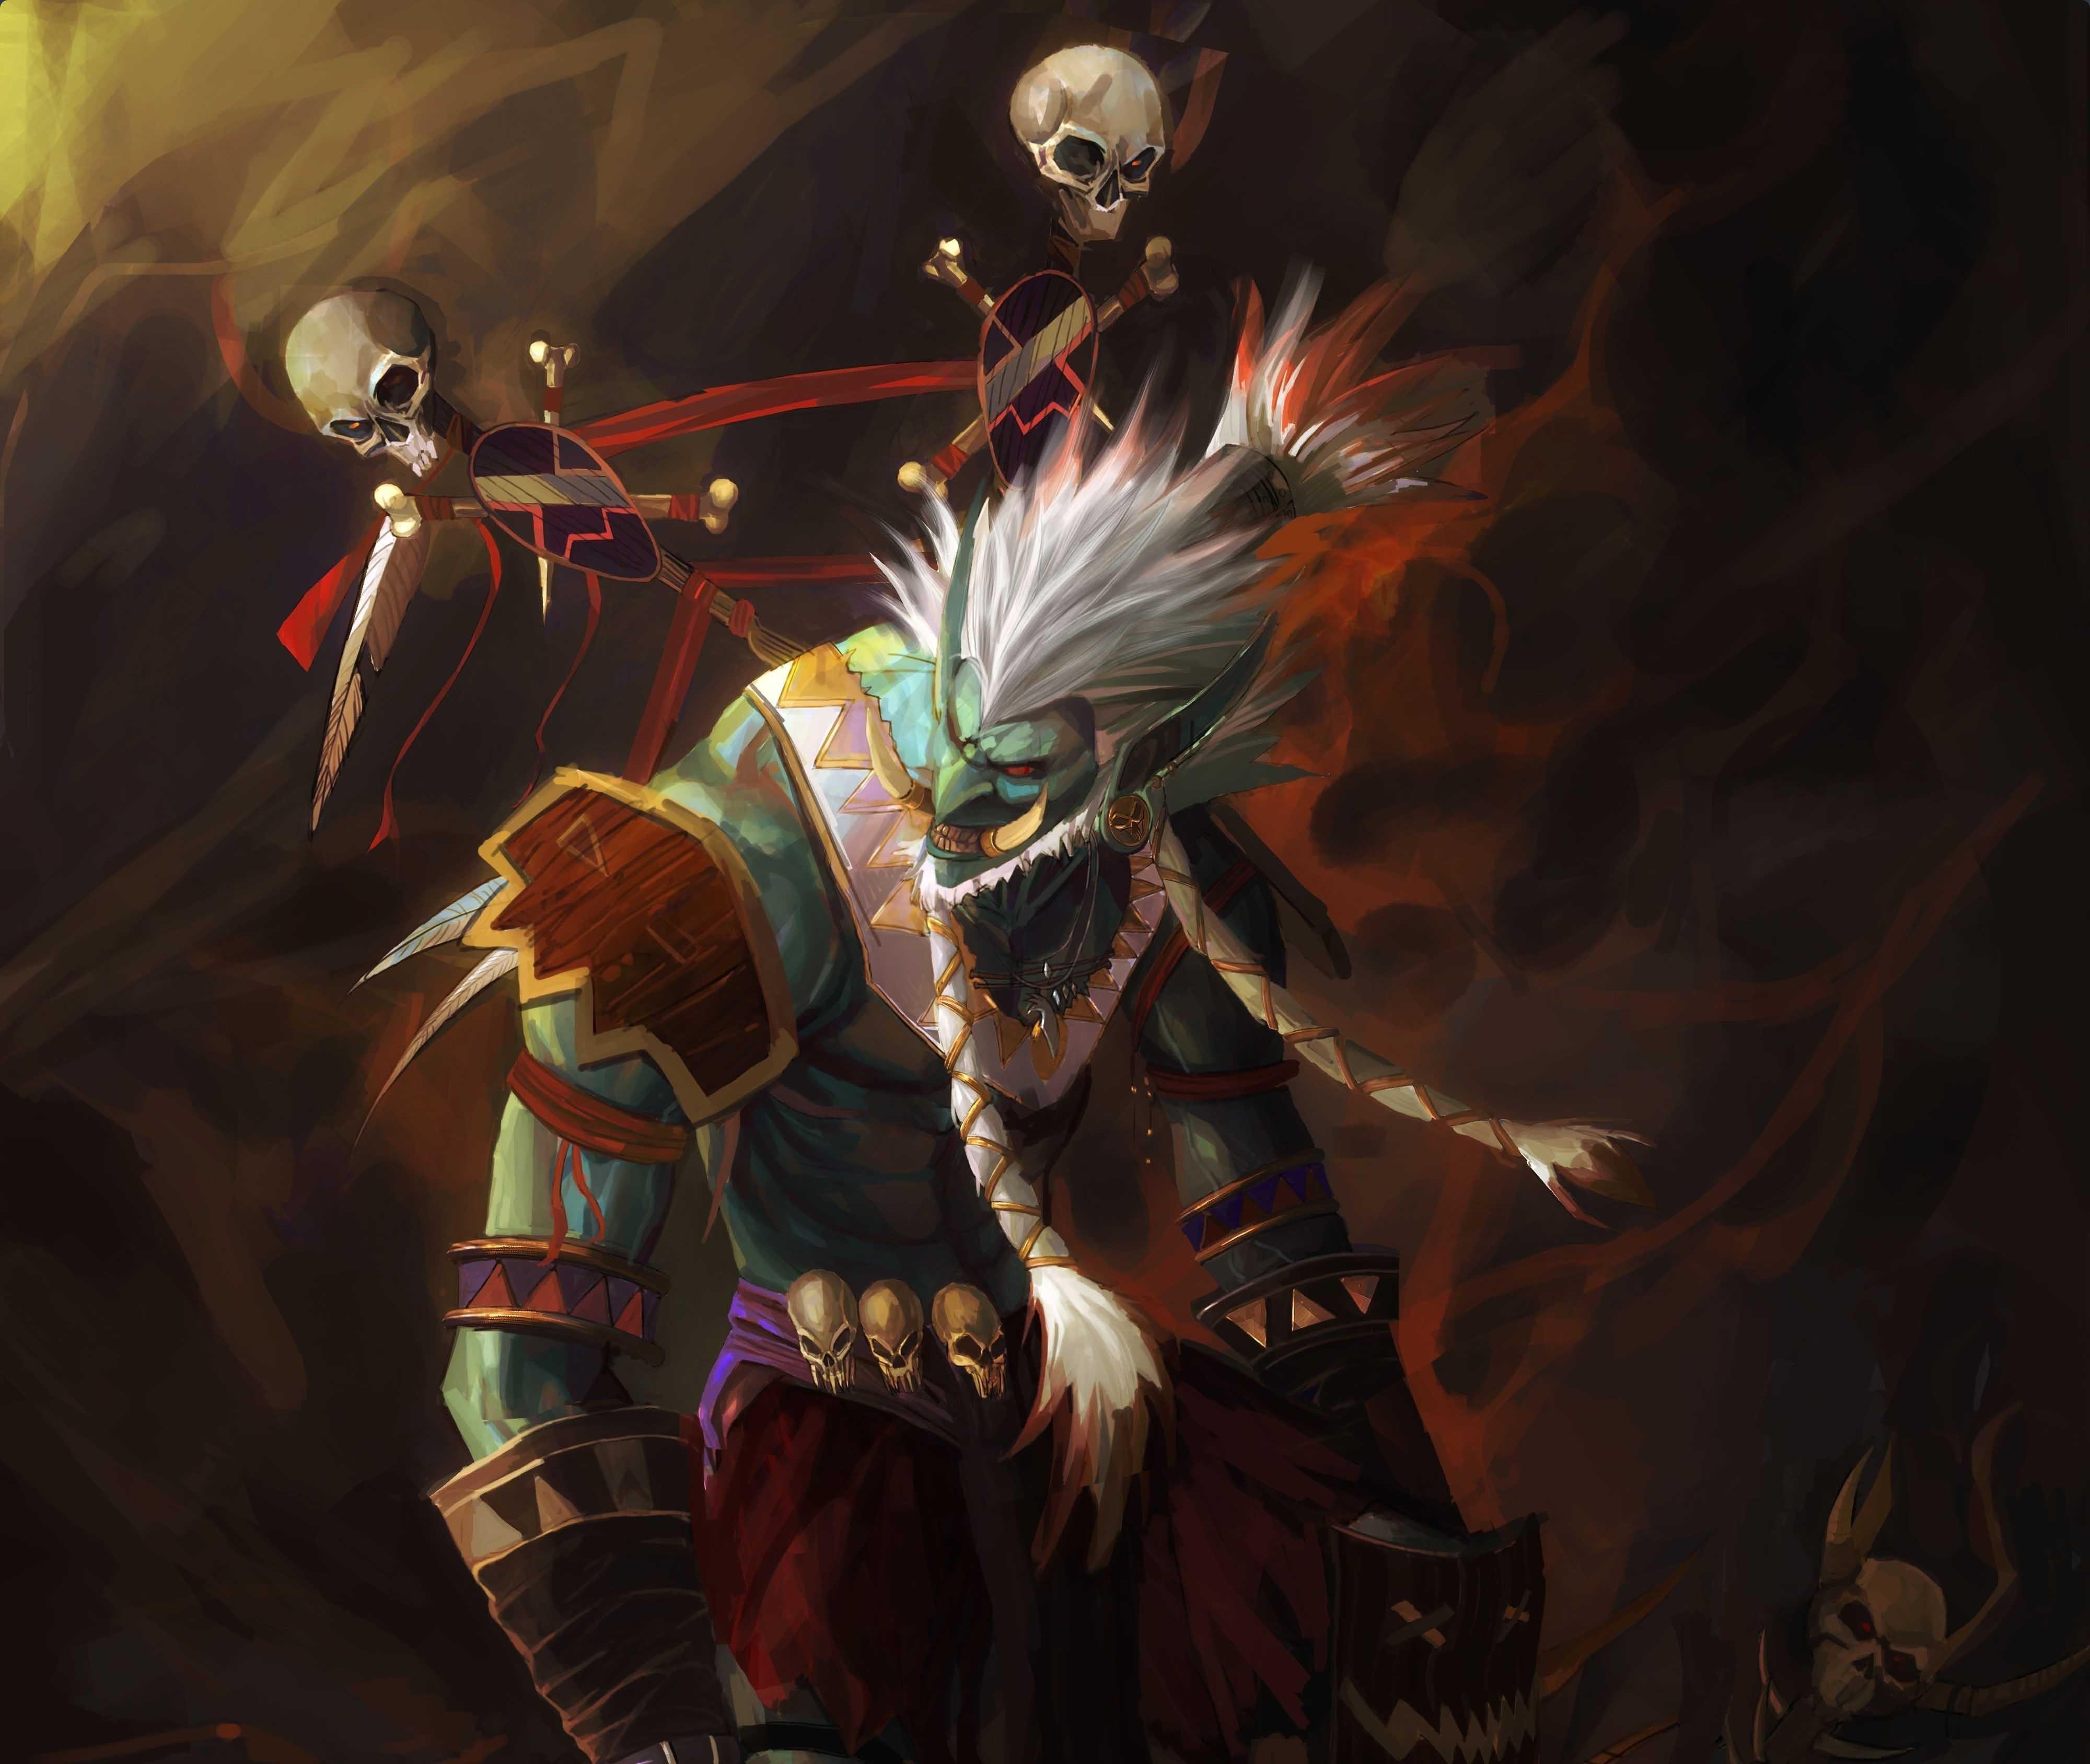 Wallpaper Anime World Of Warcraft Comics Mythology Shaman